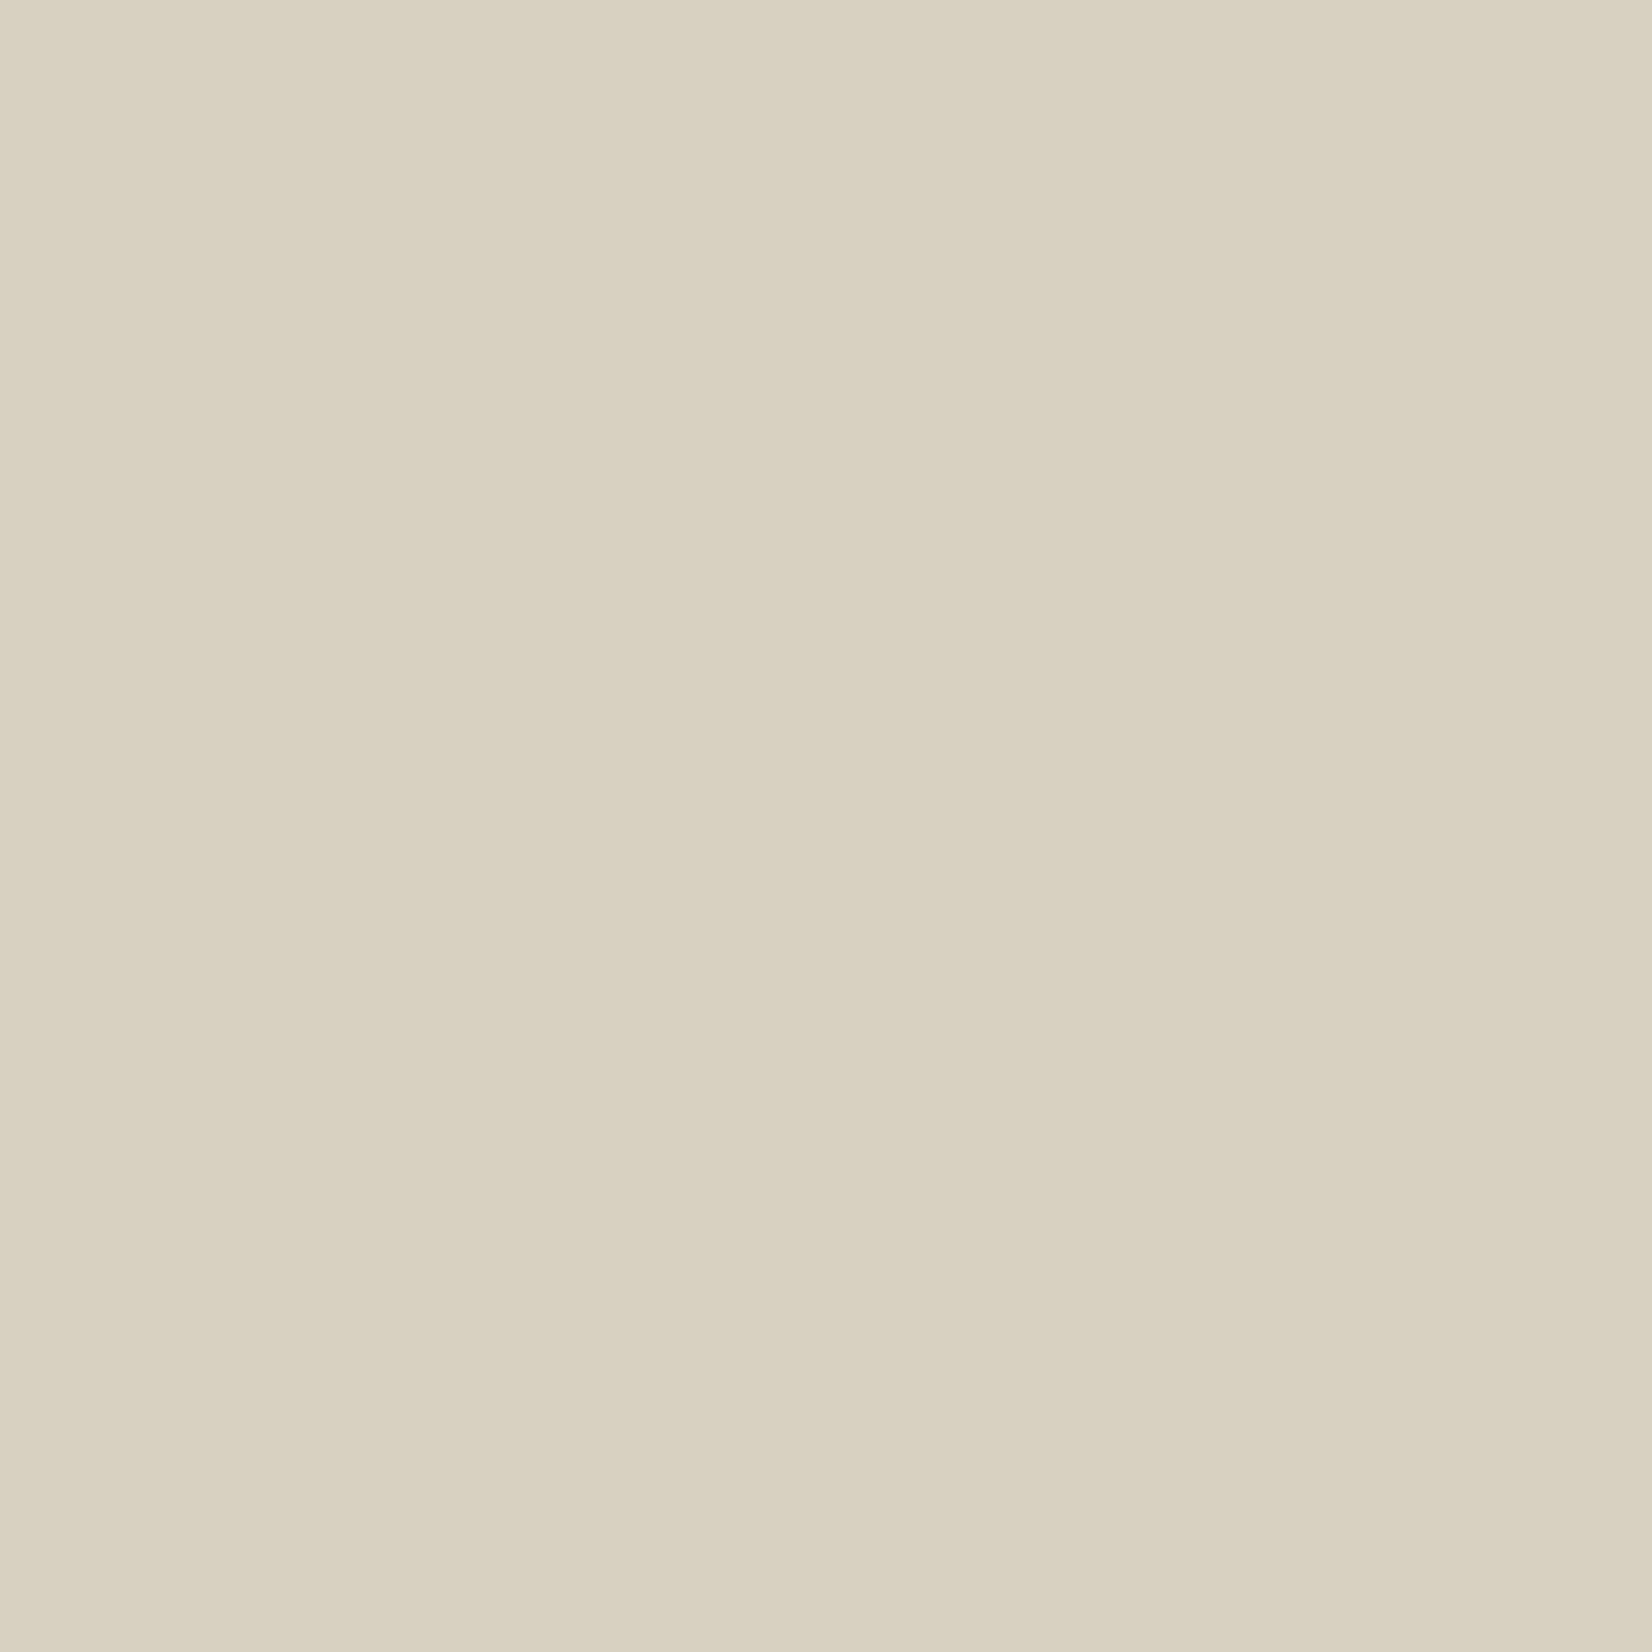 Andover CENTURY SOLIDS - CHAMPAGNE -  PER CM OR $14/M